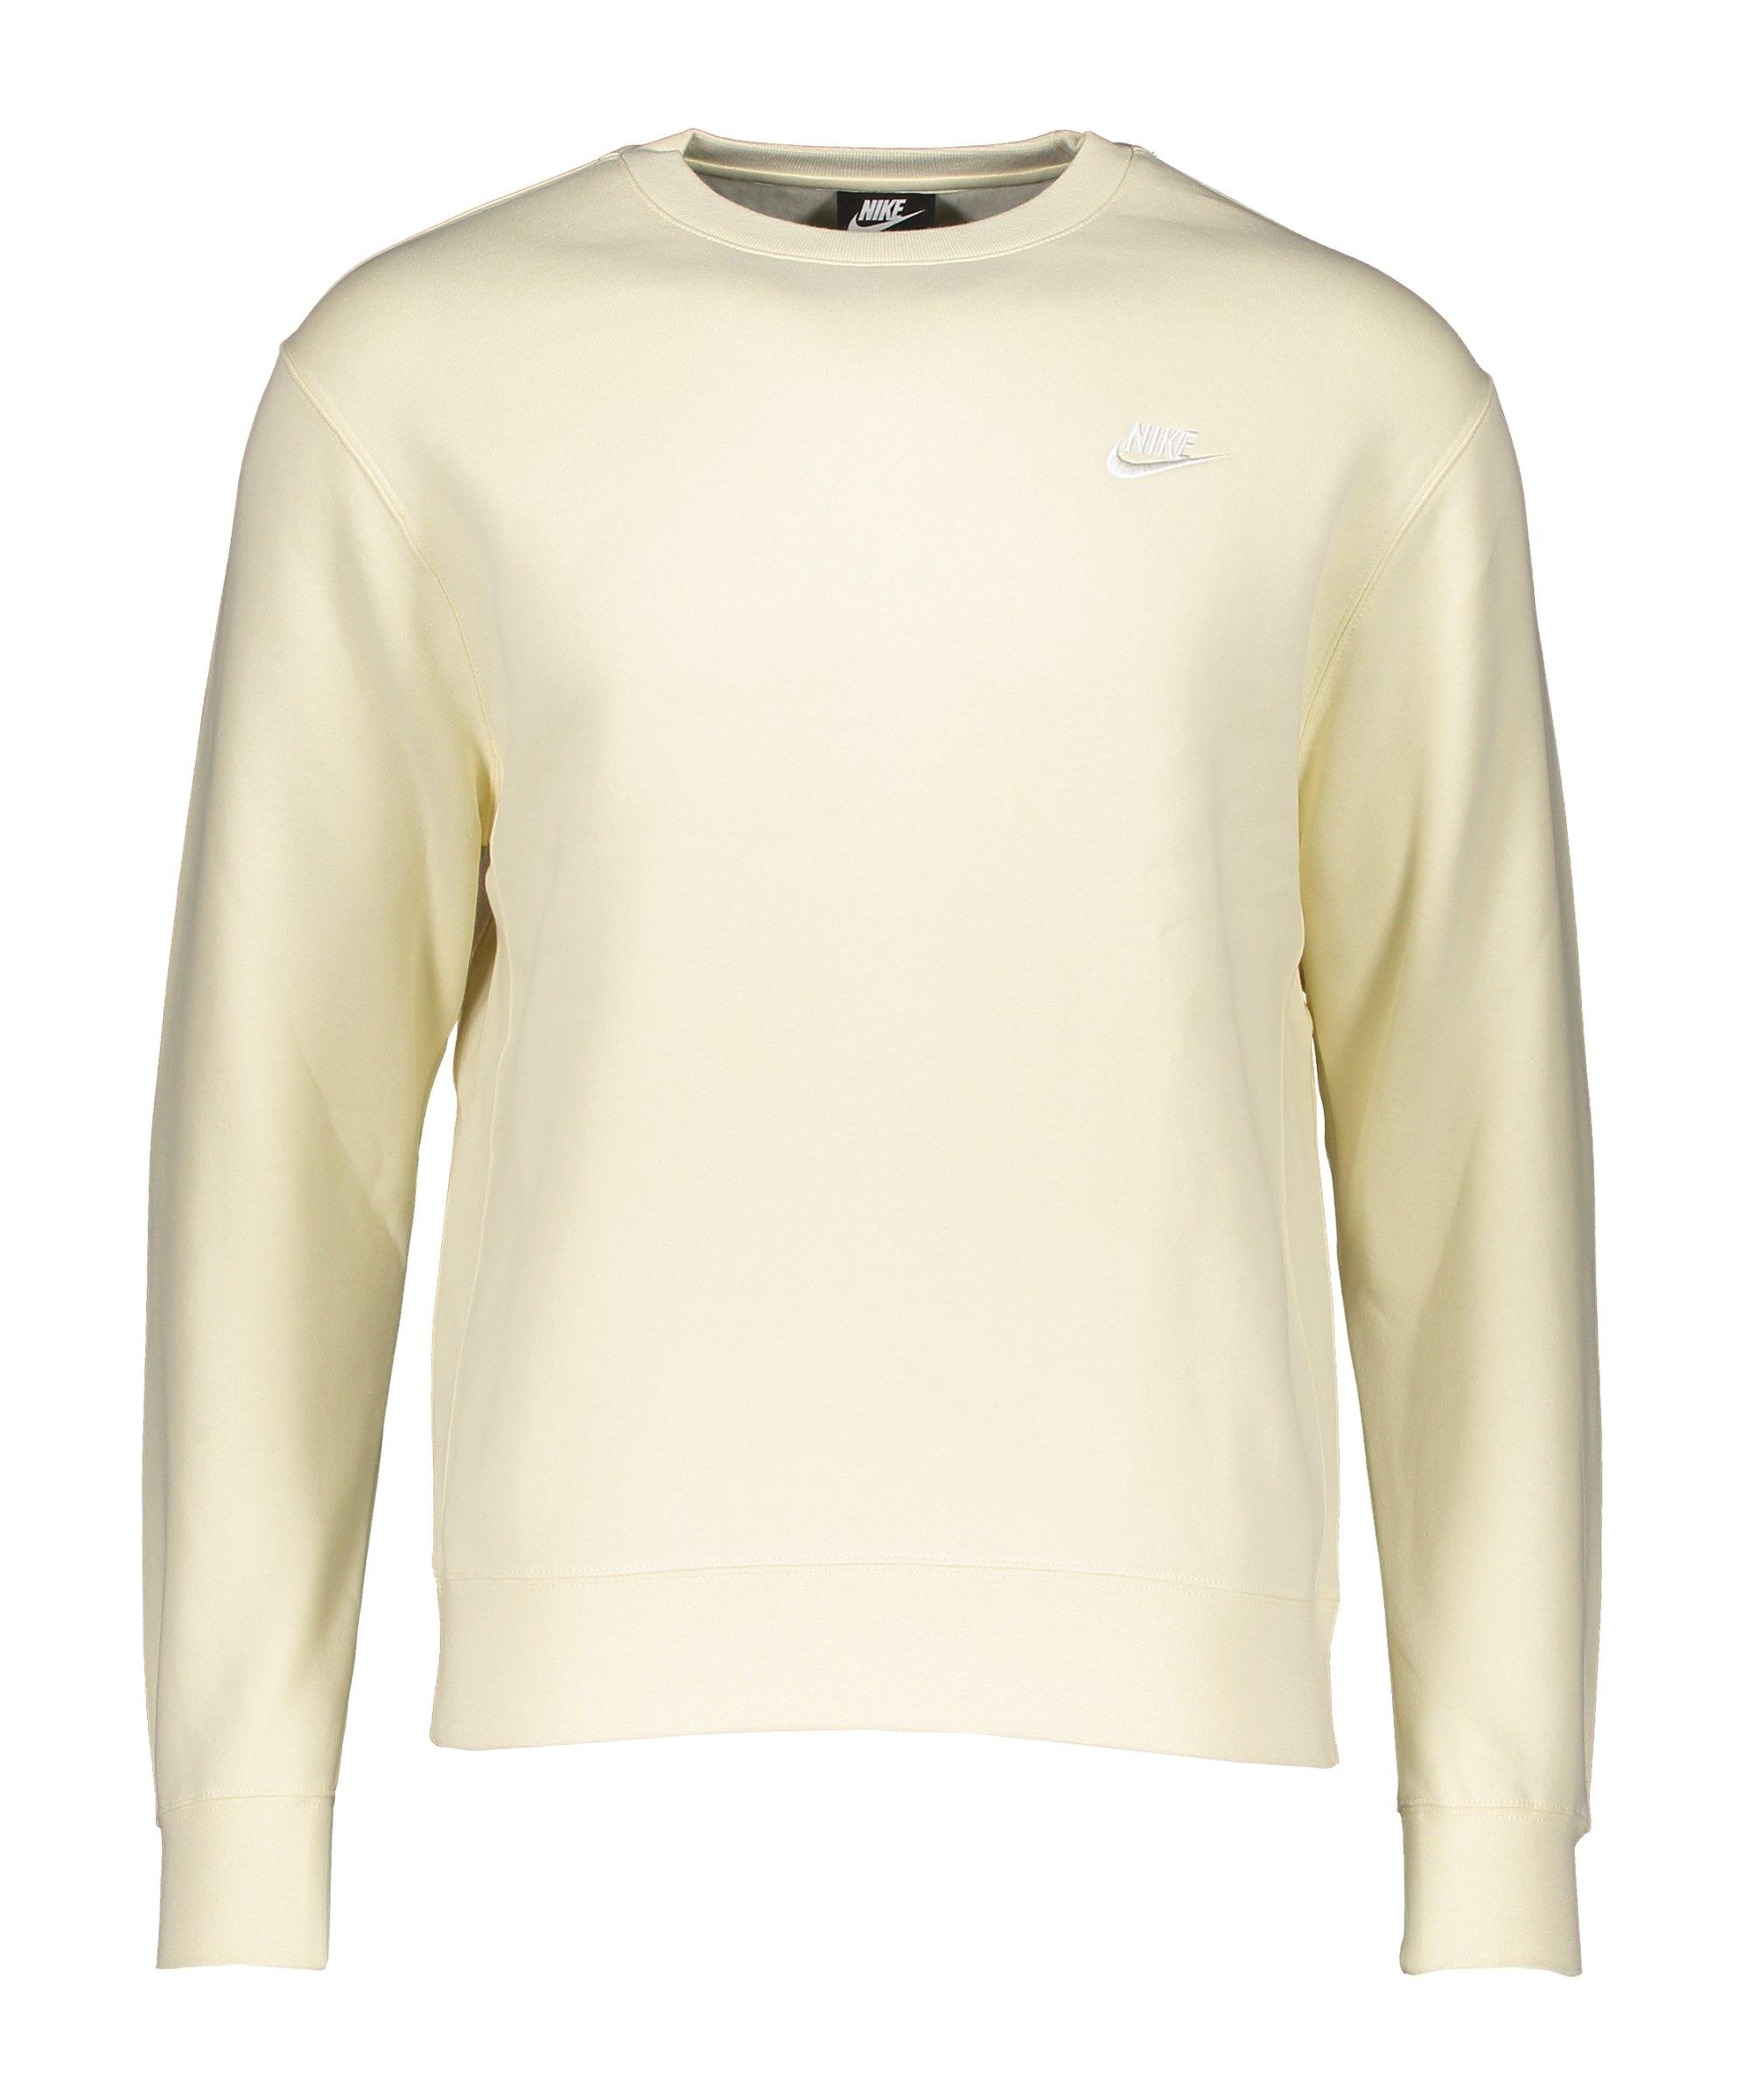 Nike Club Crew Sweatshirt Beige F113 - beige